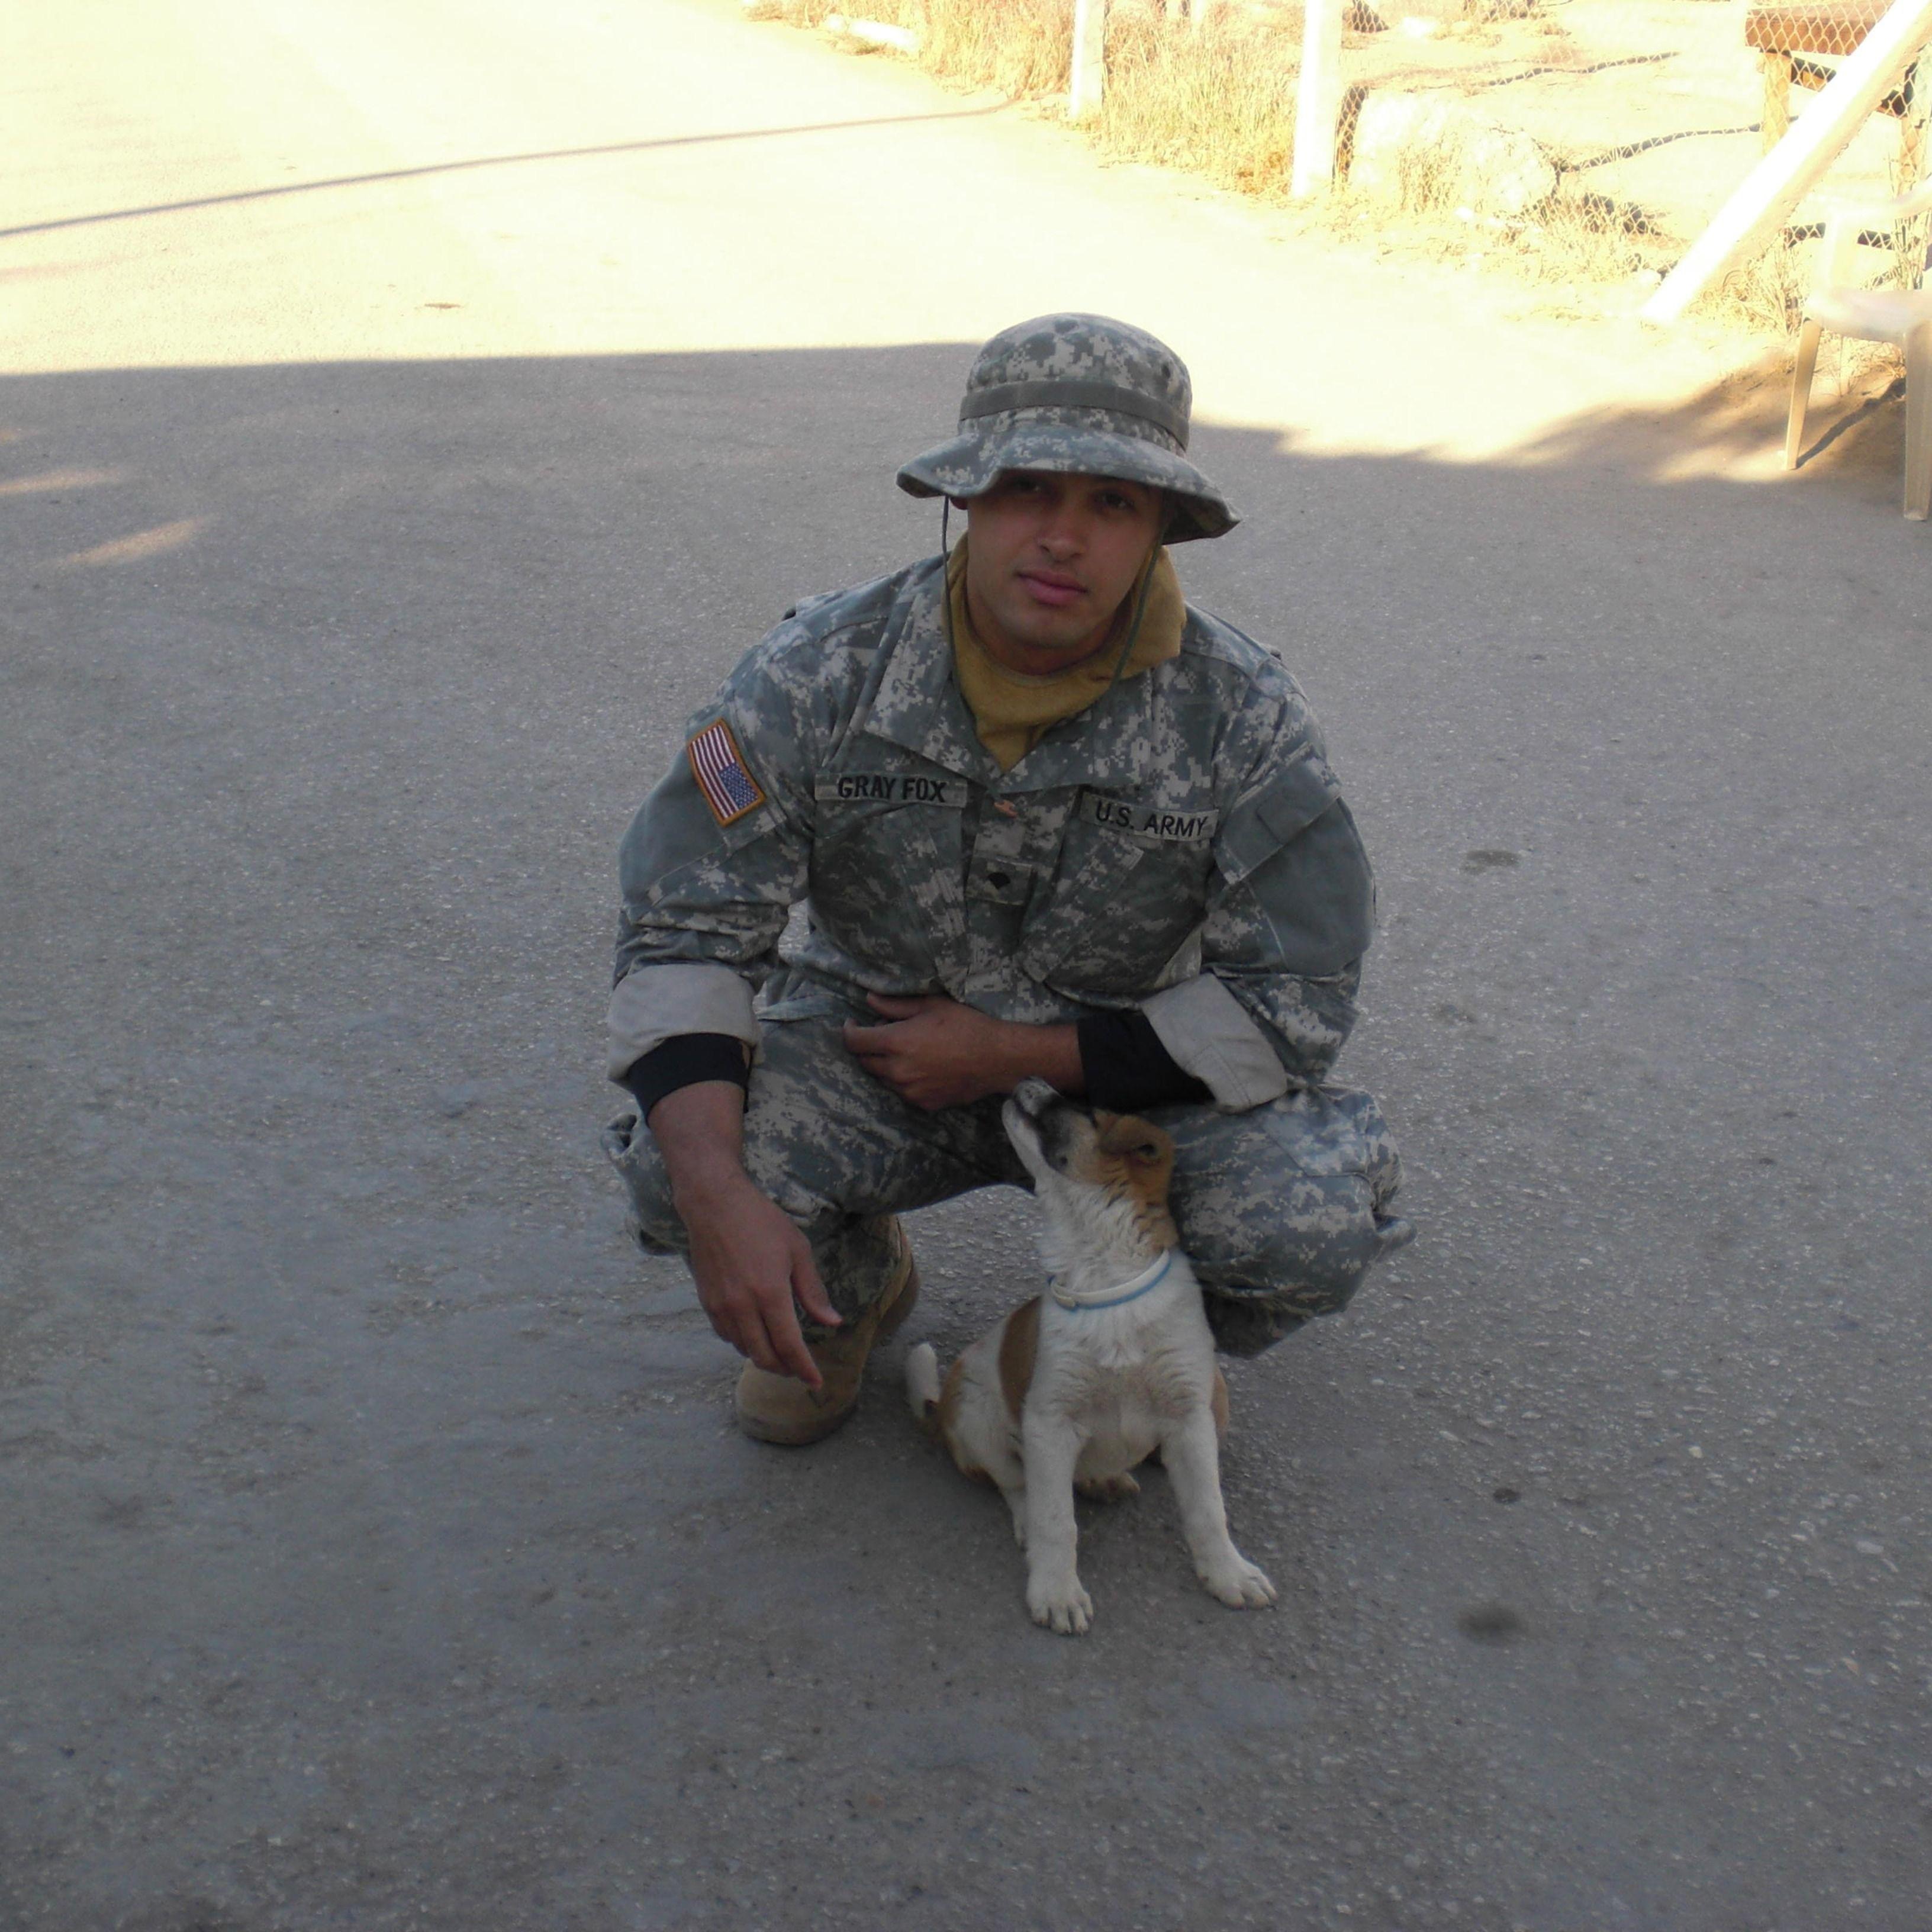 Christopher alvarez was deployed to alhillah iraq in